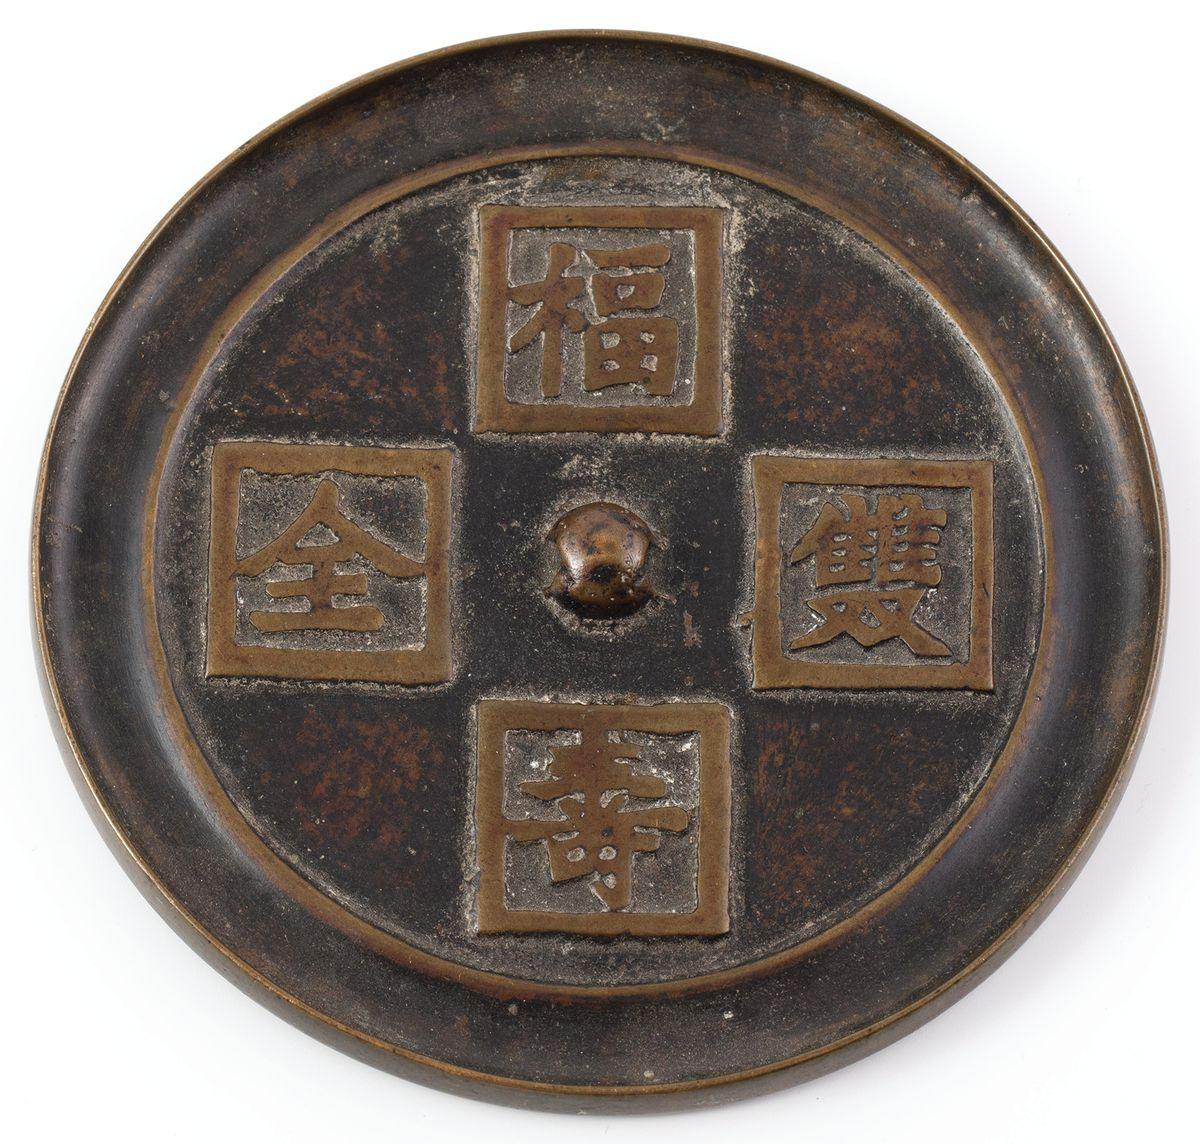 LUSTRO, Chiny, XVIII / XIX w.